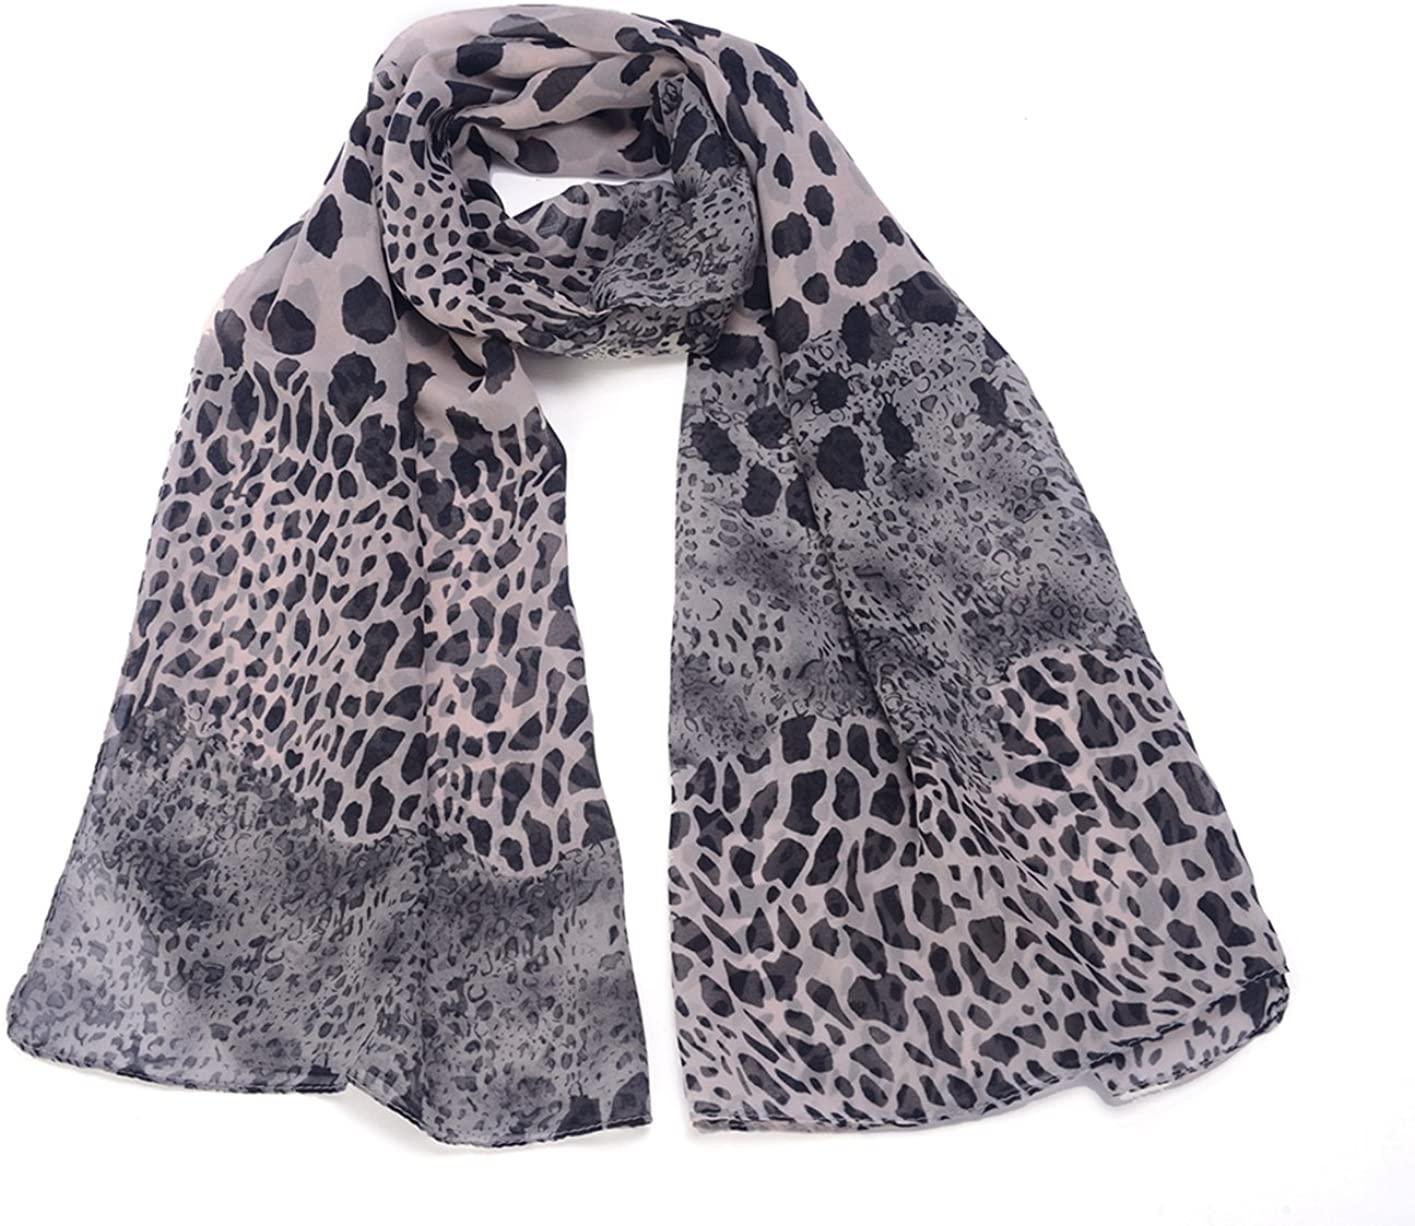 REINDEAR Women Premium Wild Style Leopard Print Scarf US Seller